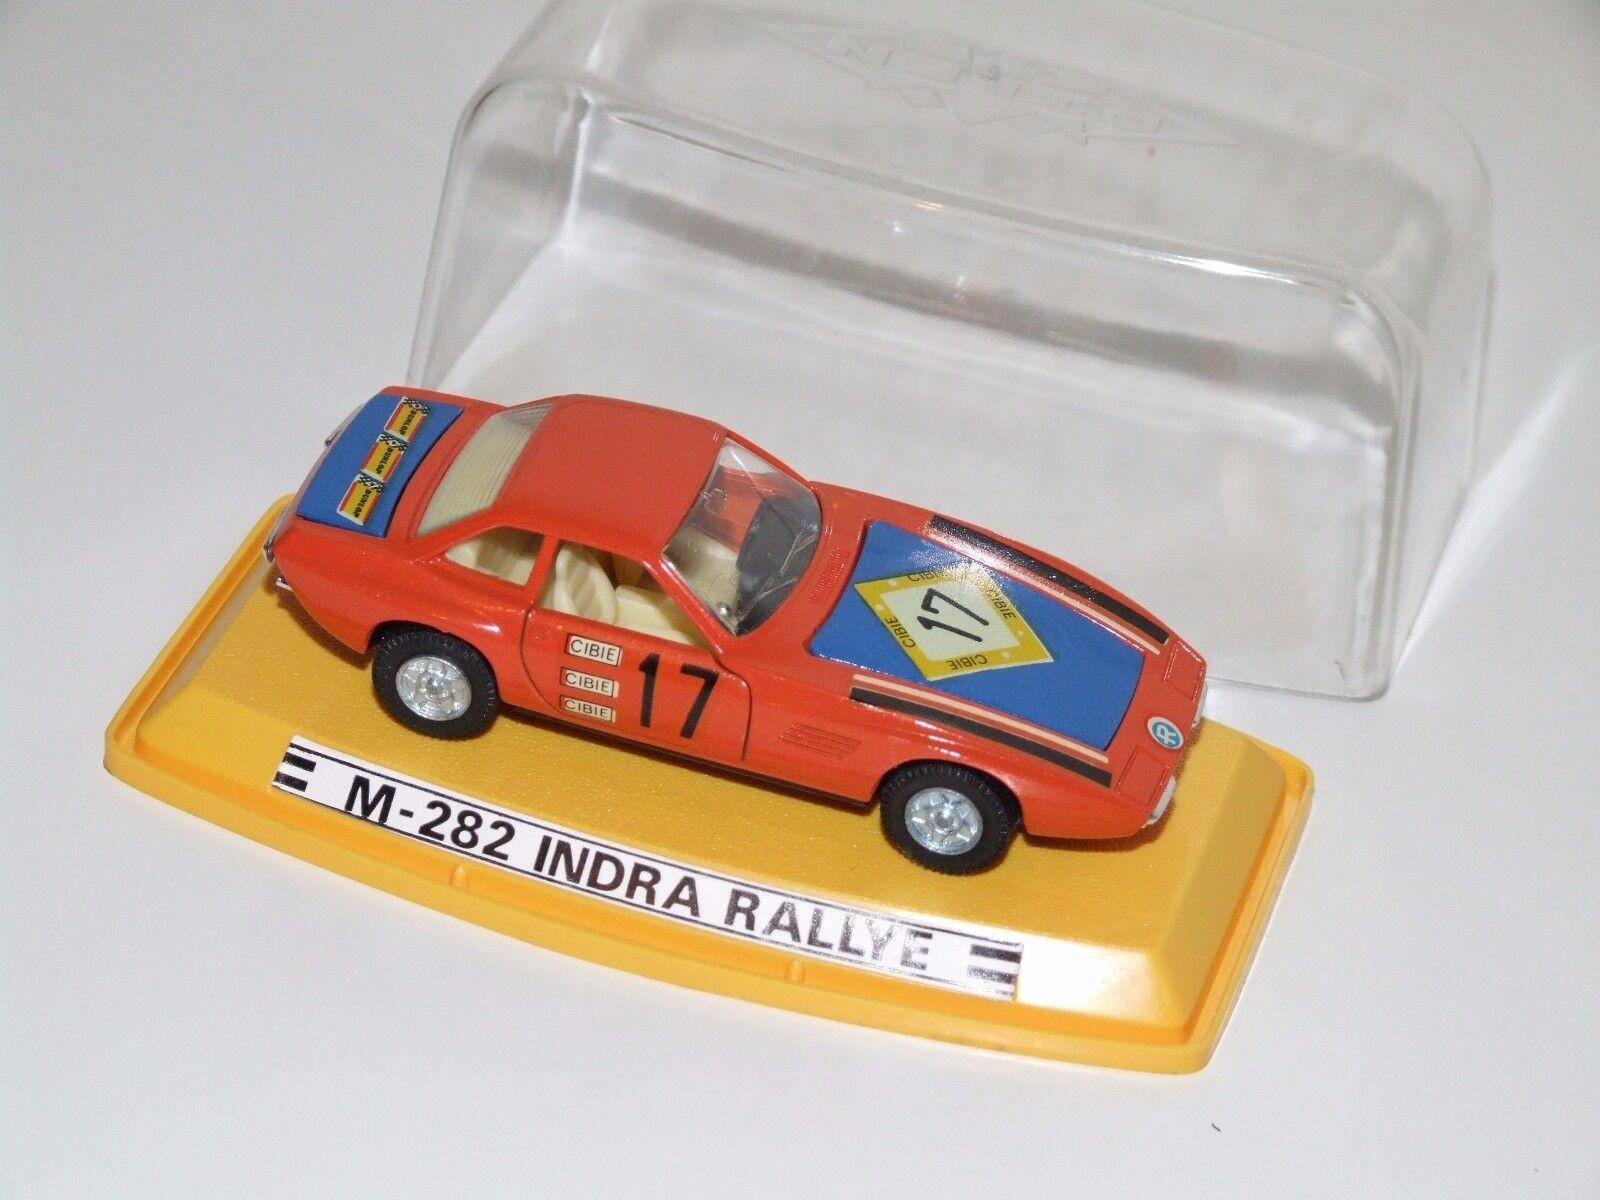 Pilen M282 Indra Rallye Rallye Rallye Rally car ce04ad